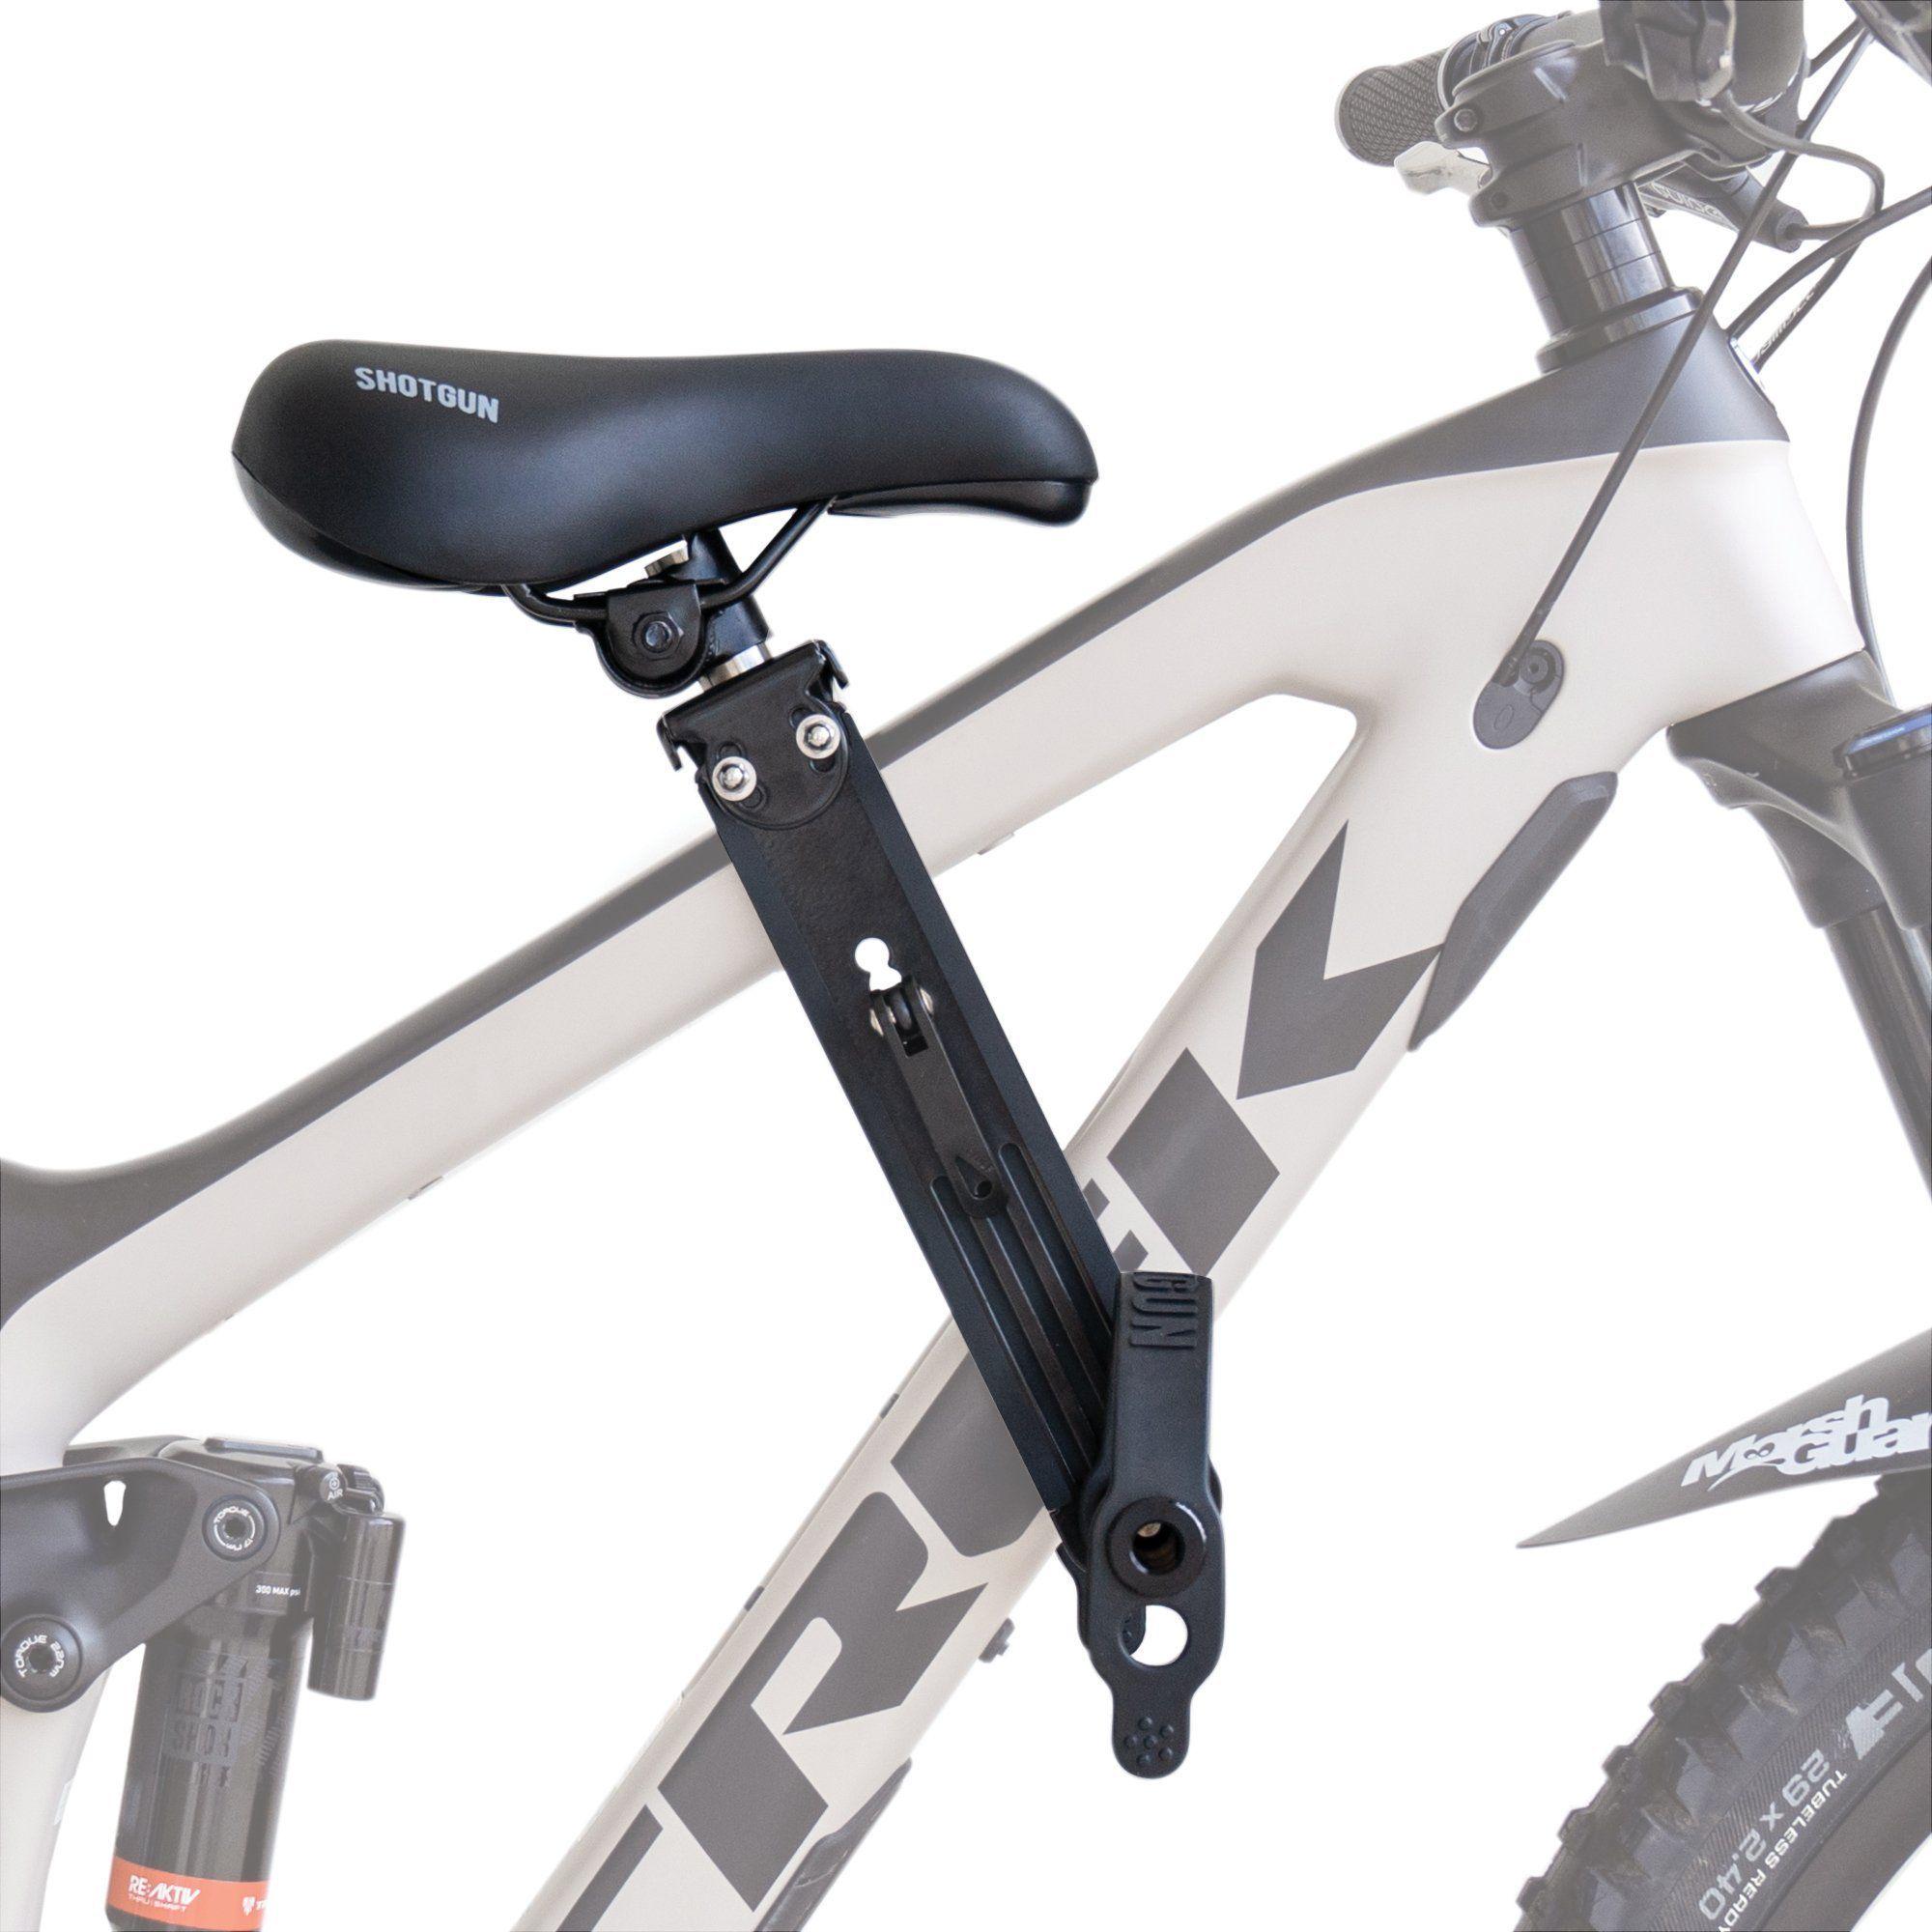 Front Mounted Child Bike Seat In 2020 Child Bike Seat Bike Seat Kids Bike